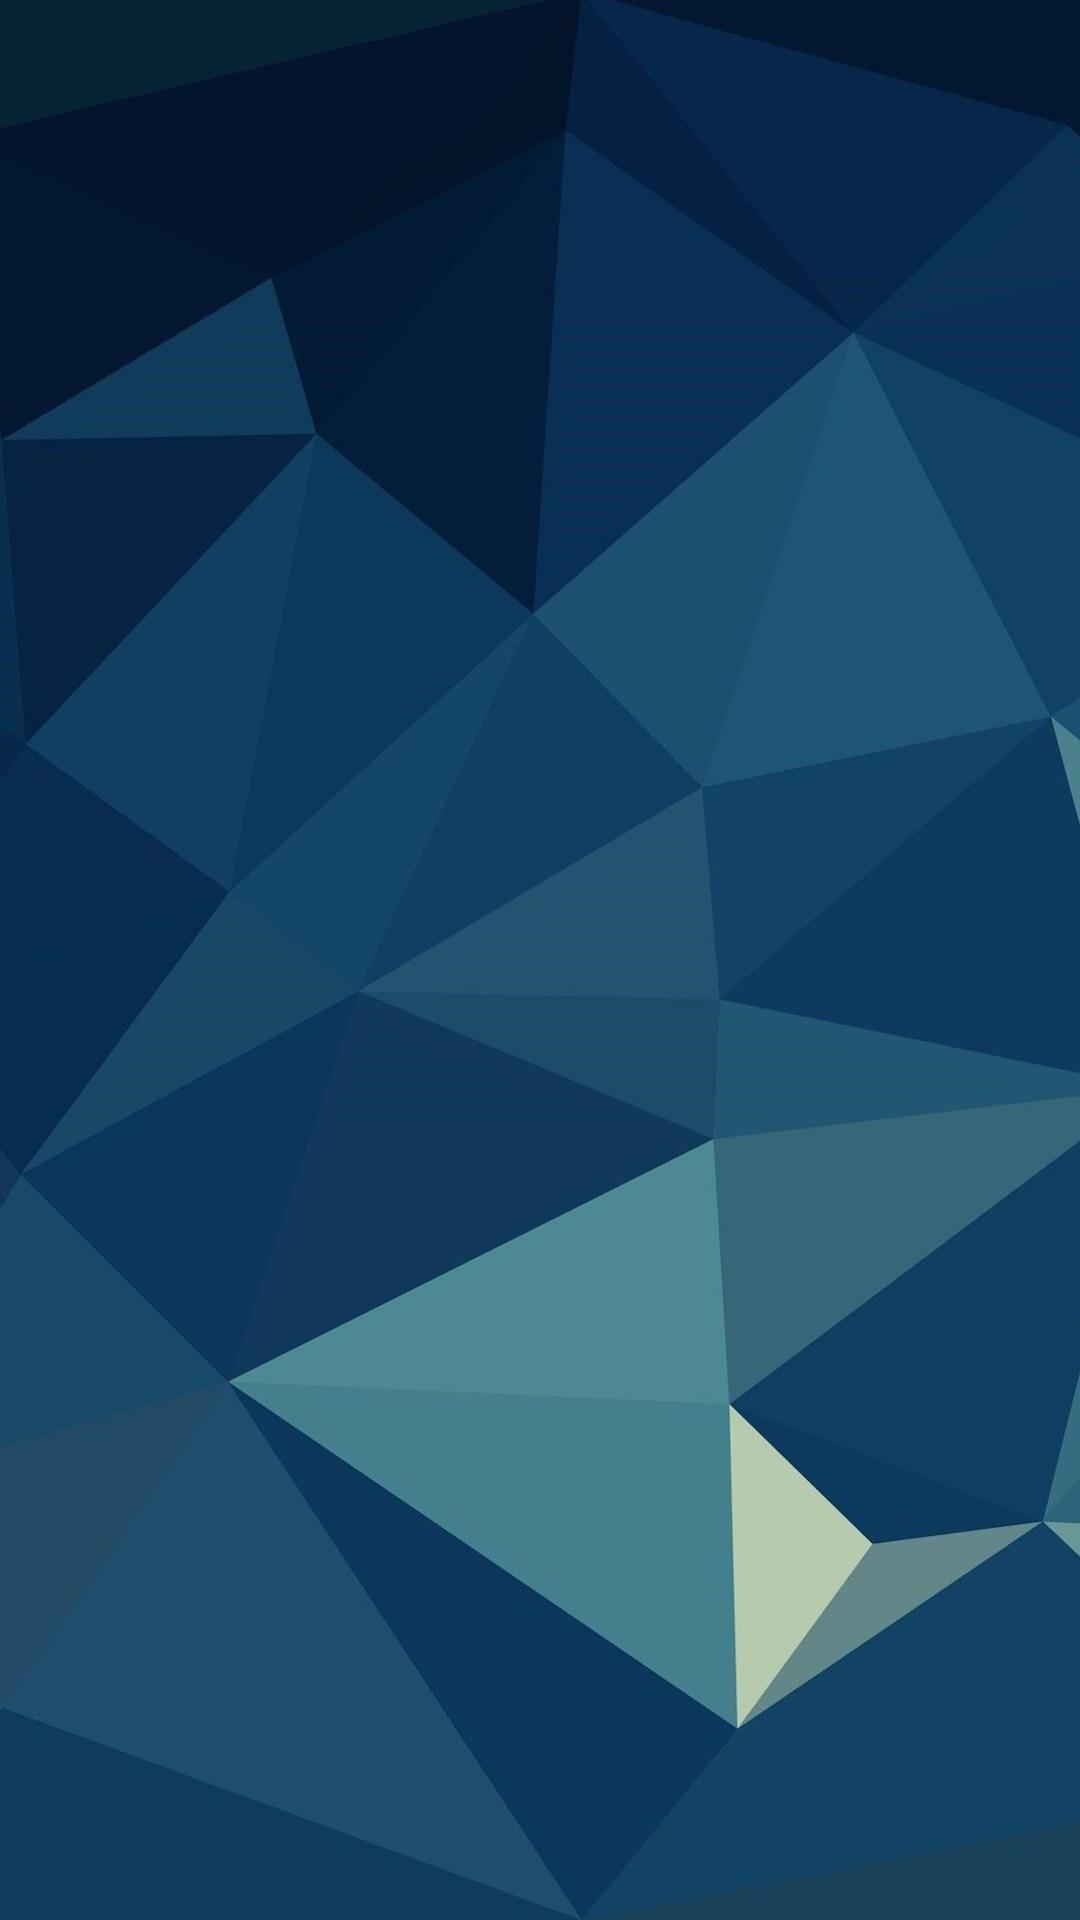 Cute Ballet Wallpapers Minimalism Triangle Art Hd Wallpaper 1080x1920